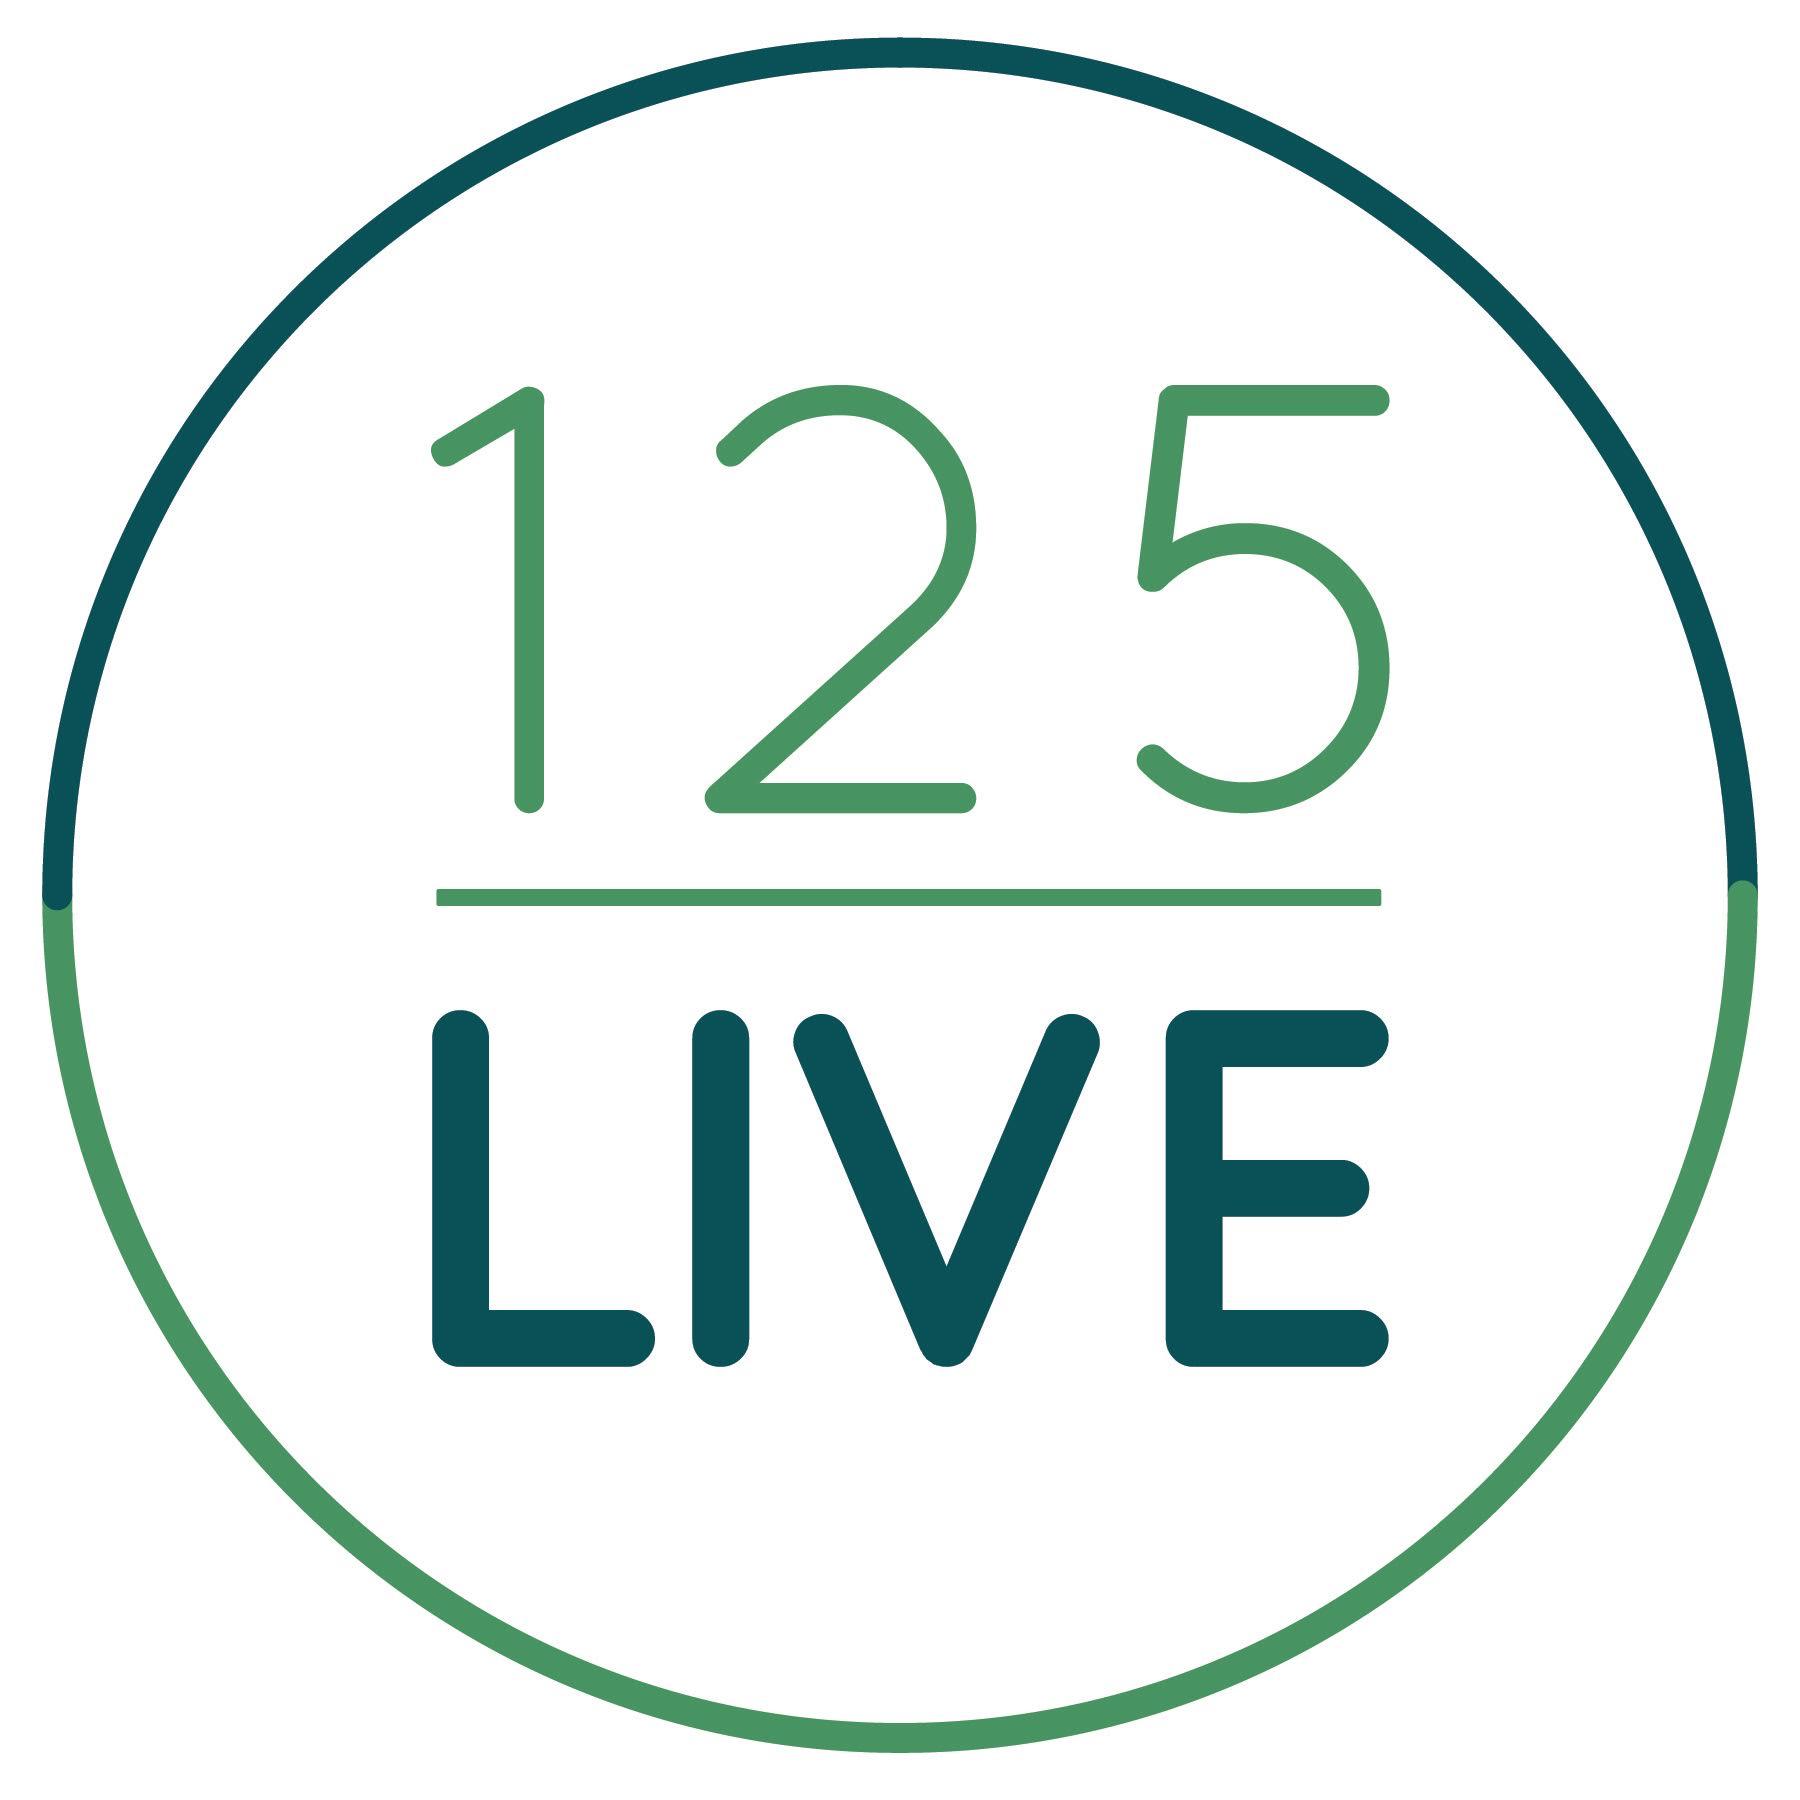 125 Live.jpg